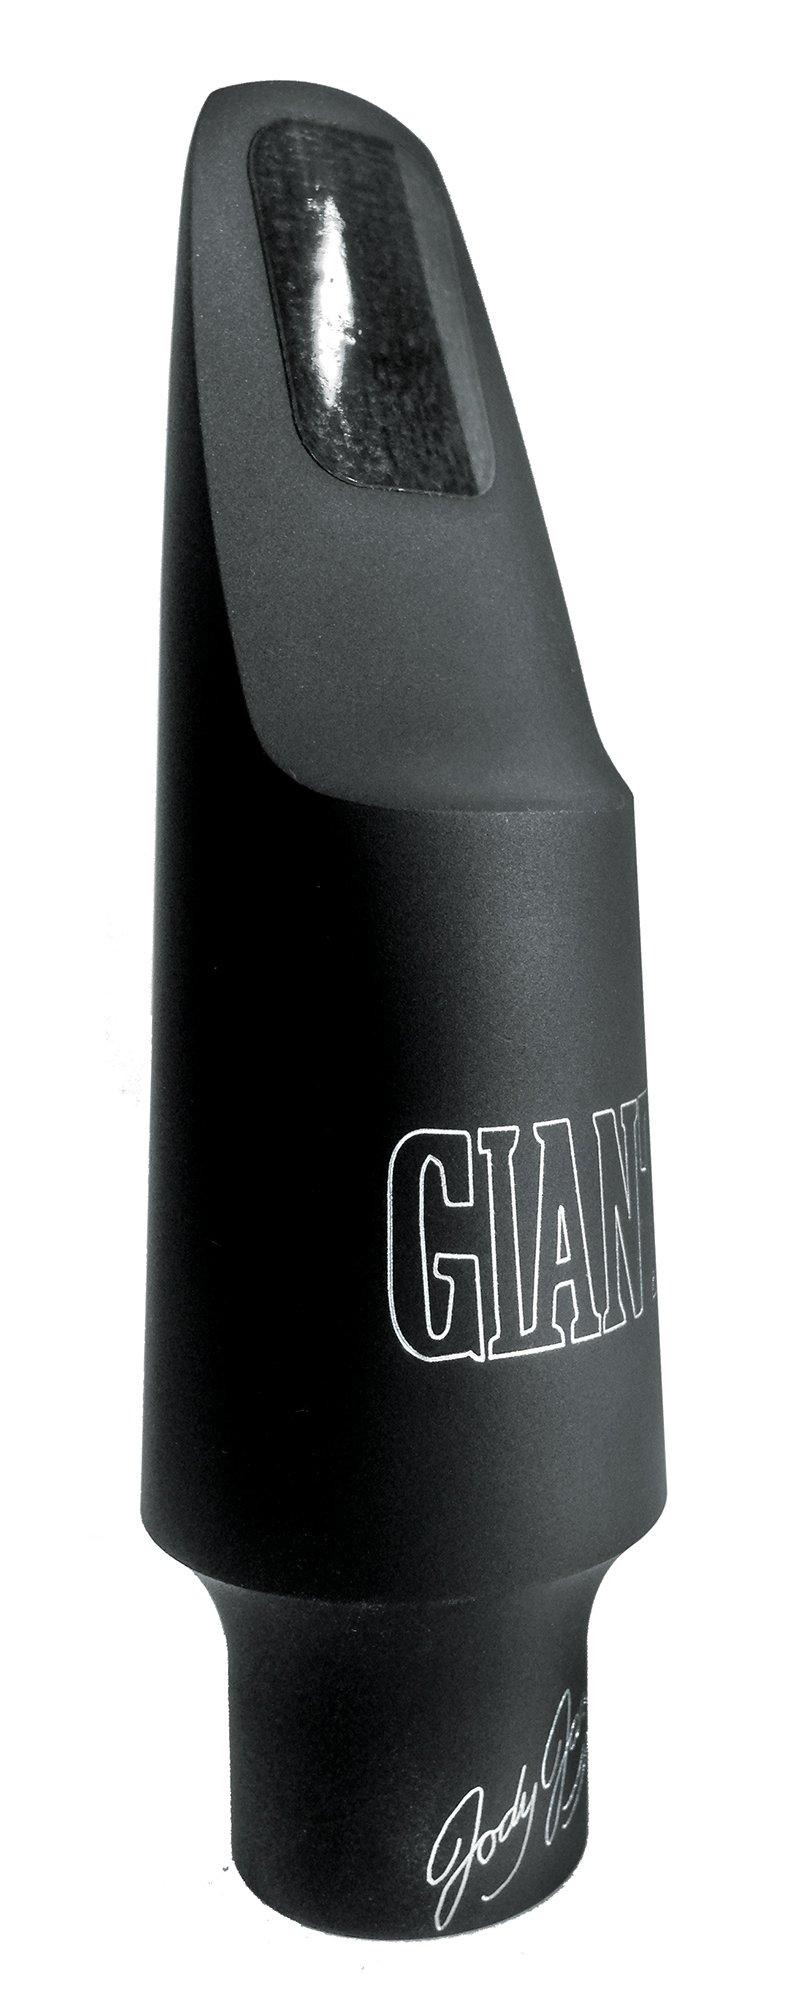 JodyJazz GIANT Tenor Saxophone Mouthpiece Model 6 (.095 Tip)